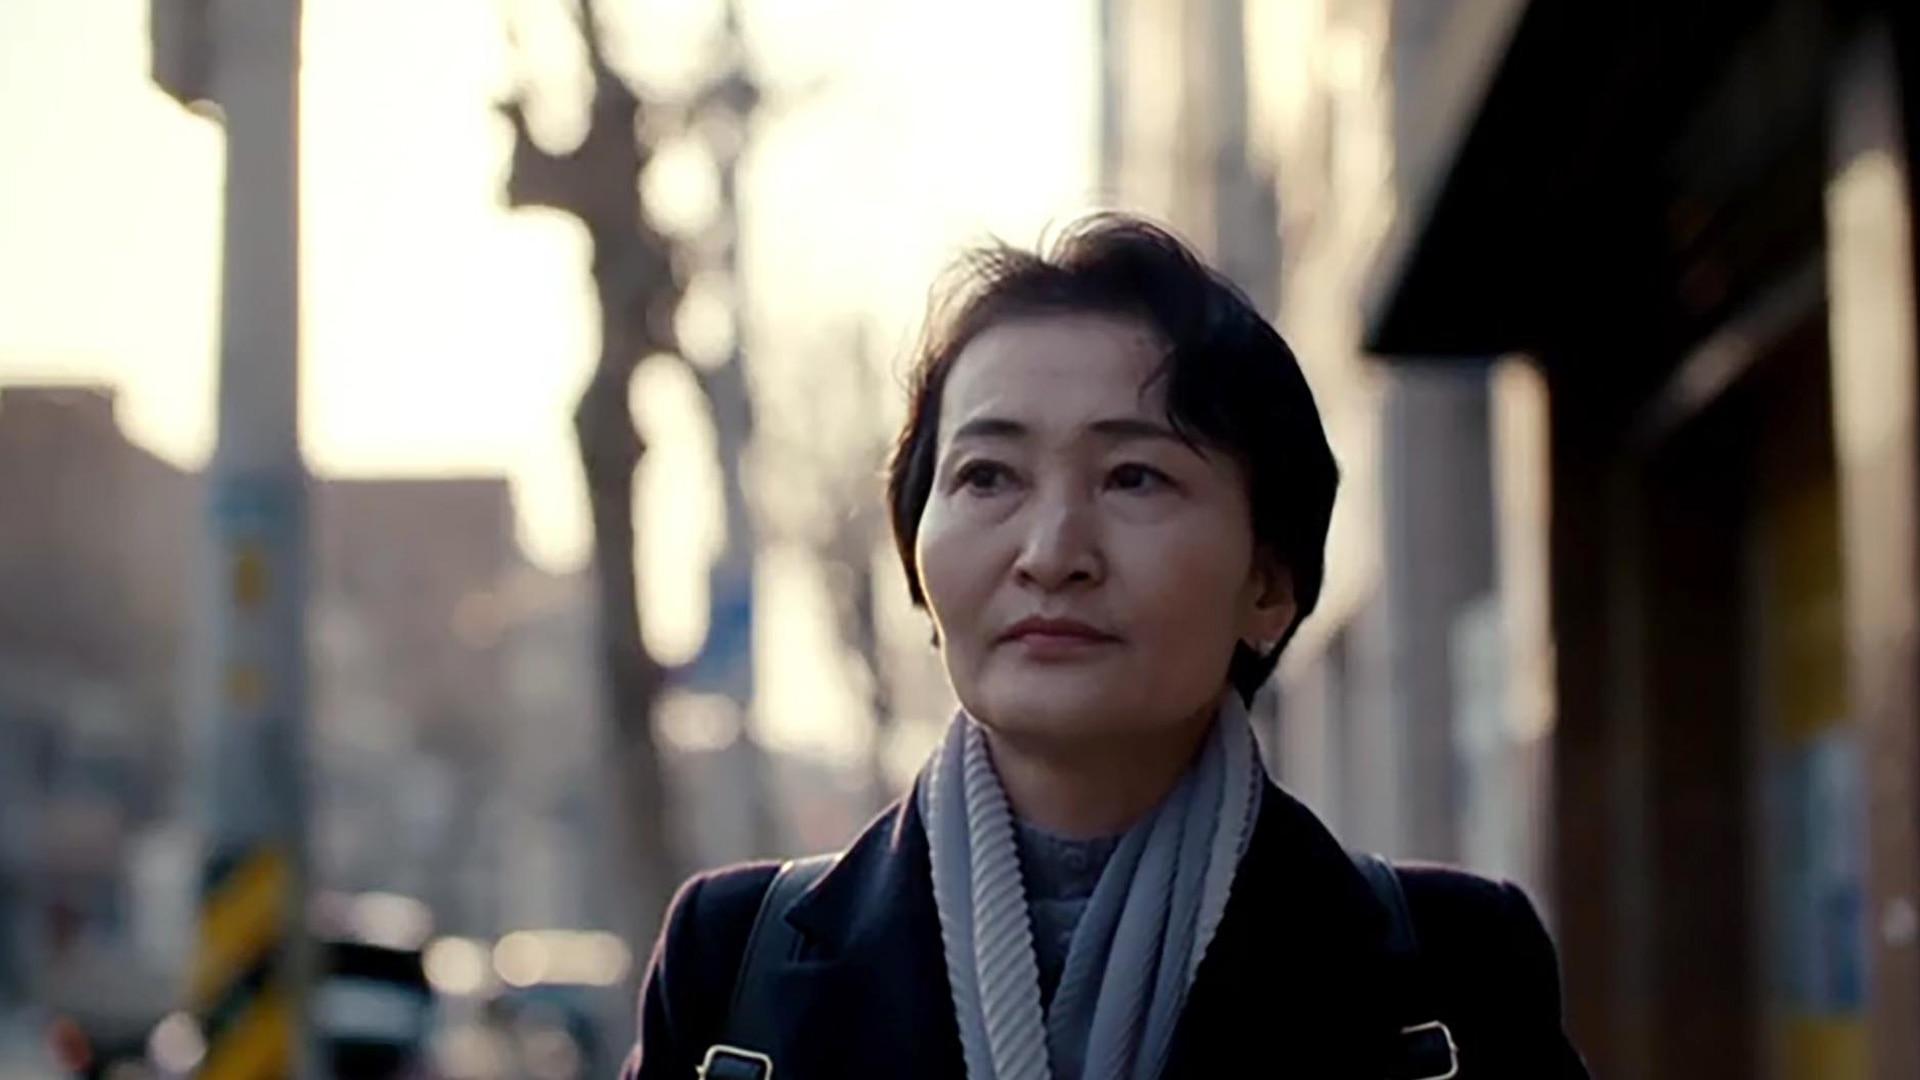 North Korea: Life Inside the Secret State 2019